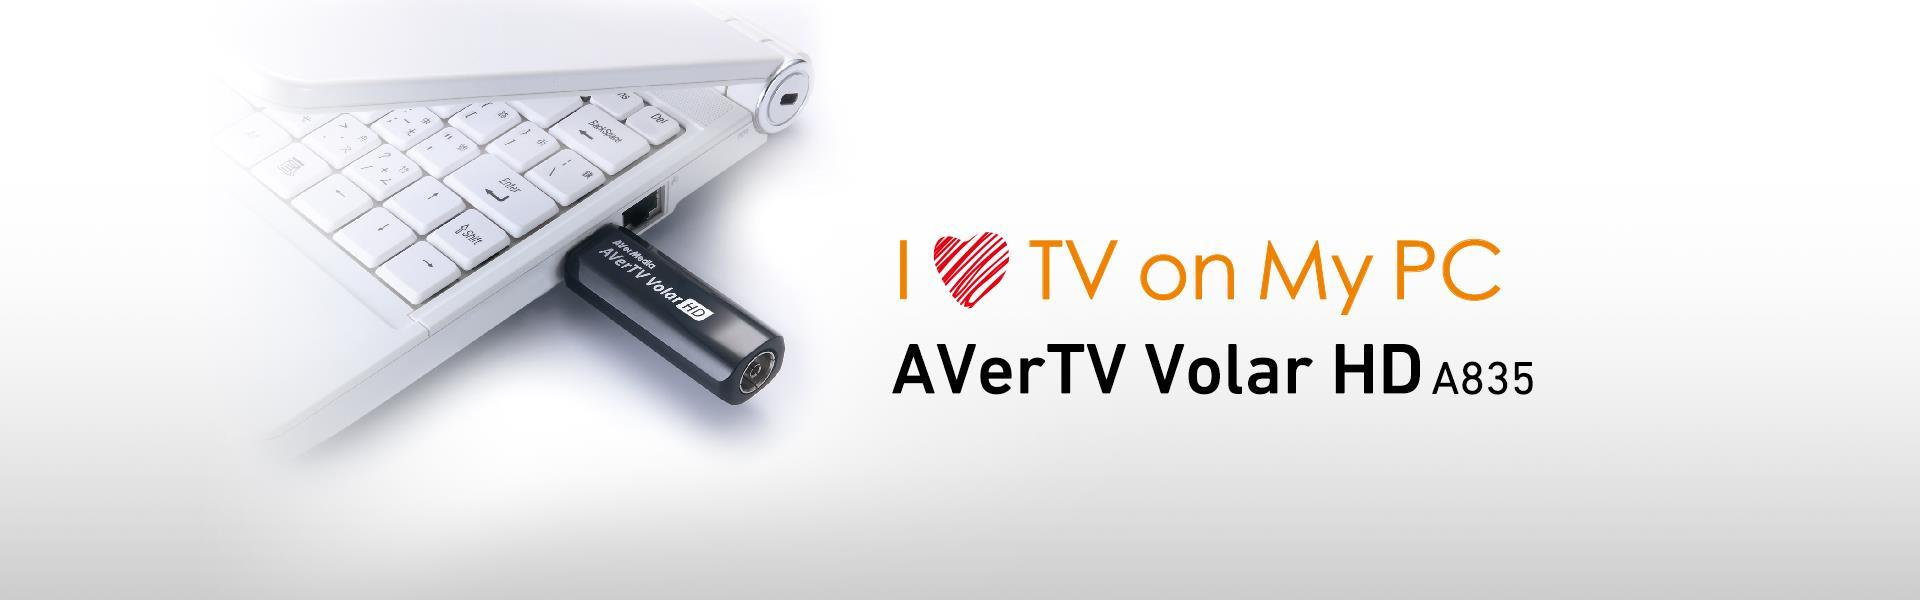 Външен тунер AVerTV Volar HD A835, USB 2.0, H.264 / MPEG-2 HDTV